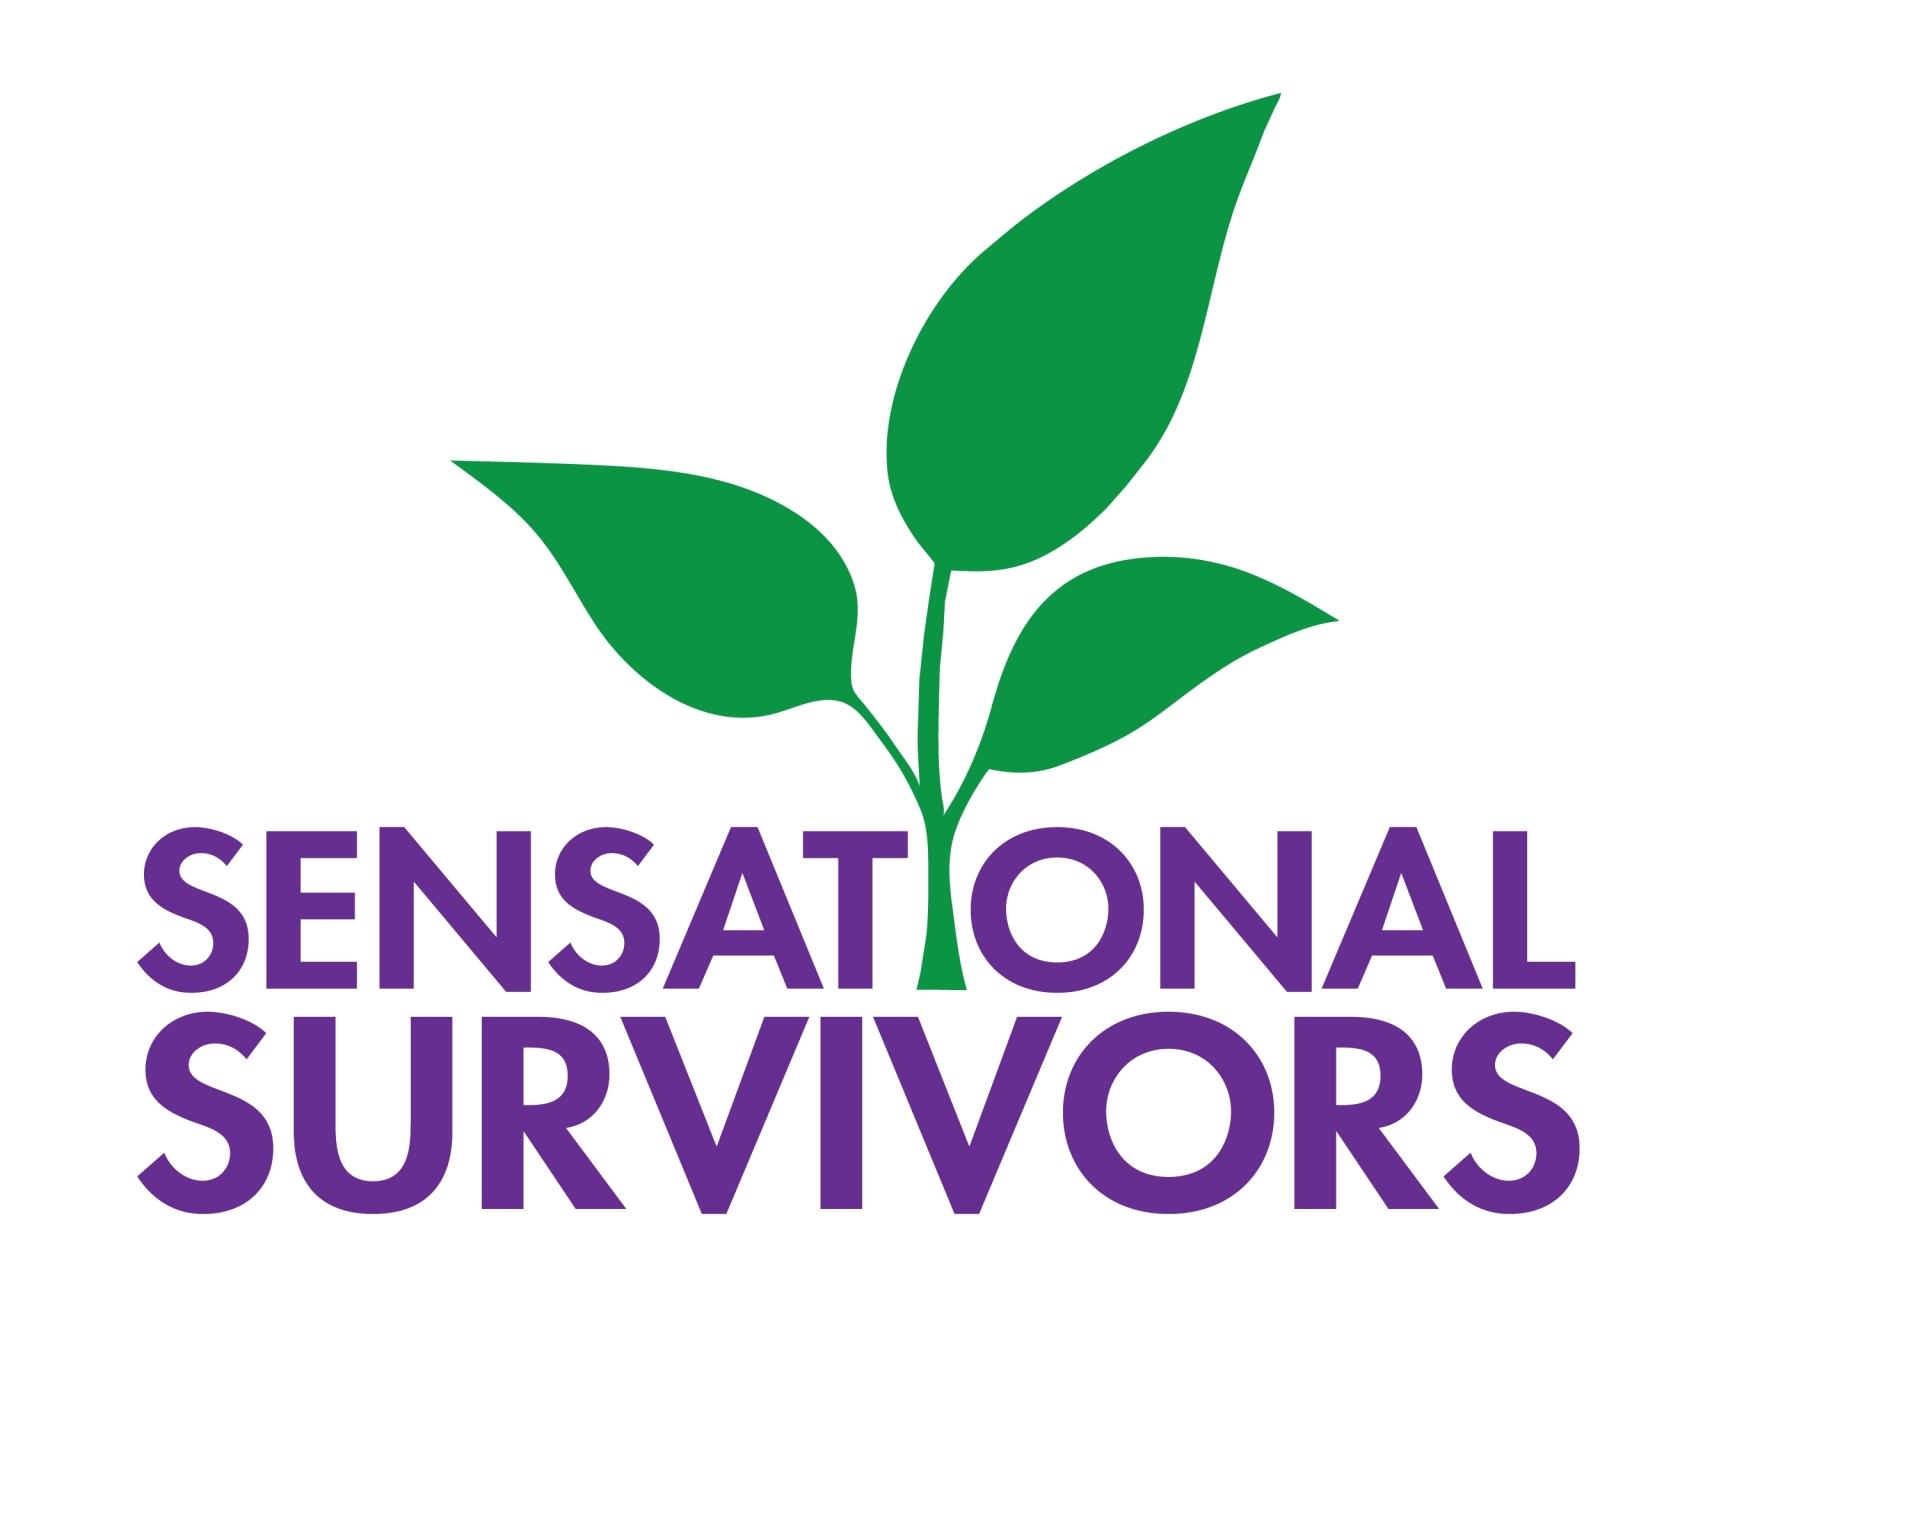 Sensational Survivors